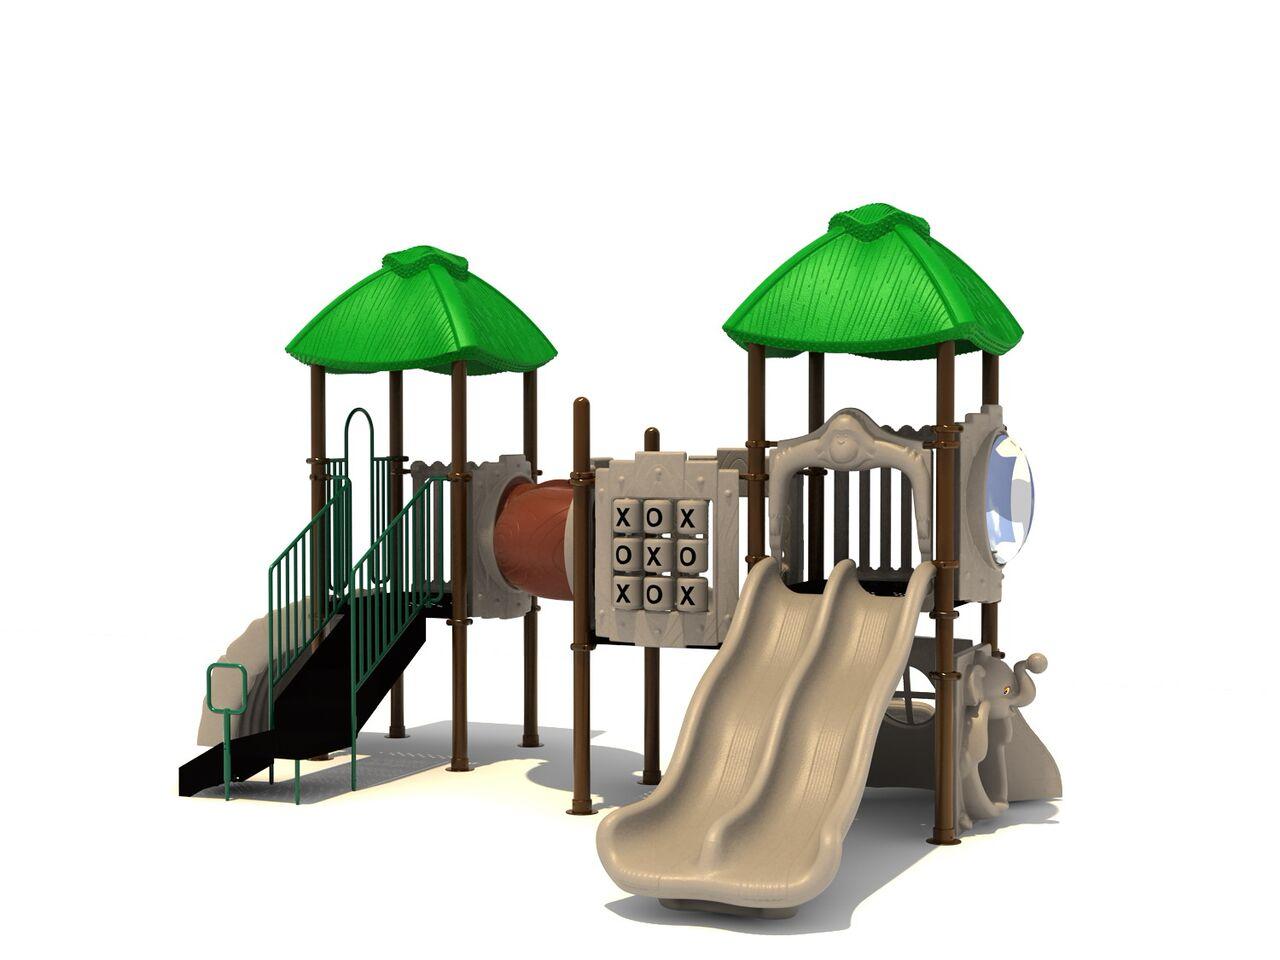 killarny commercial playground system 2